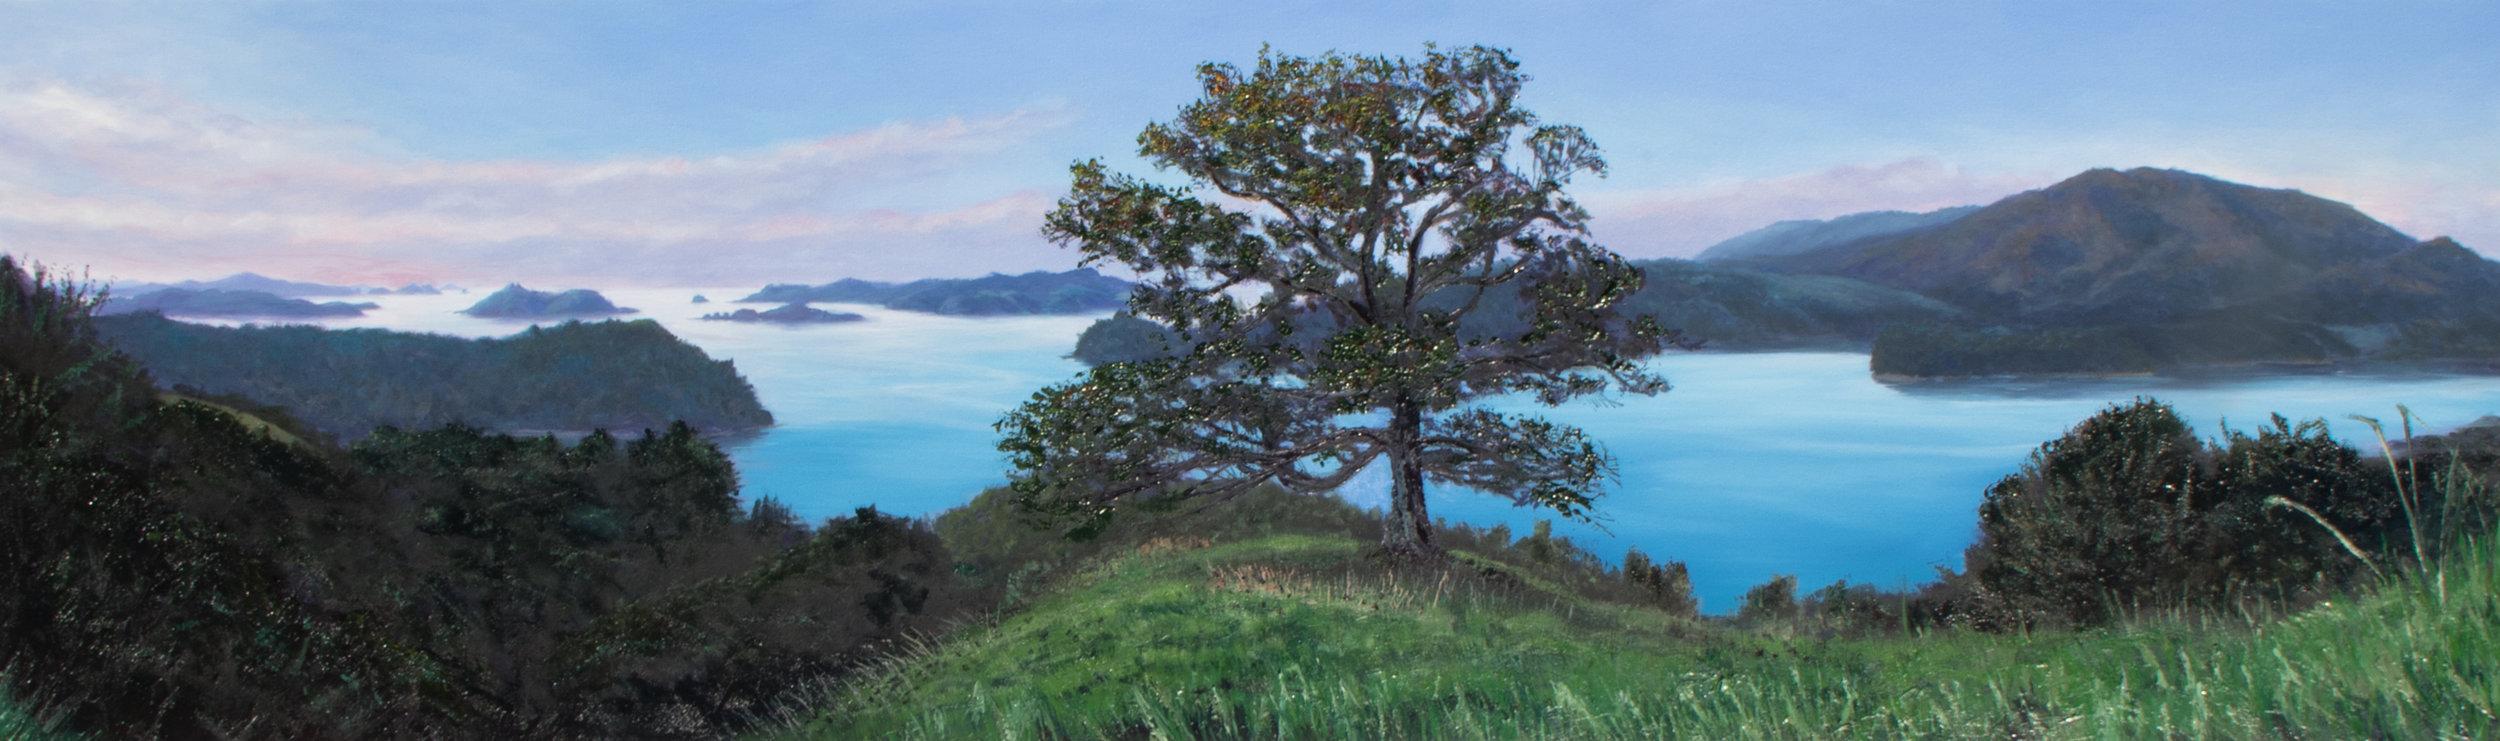 "FOR SALE 60x20"" View over Waipiro bay to Urapukapuka Islands is one of my all time favourites —- dewsyart@gmail.com"